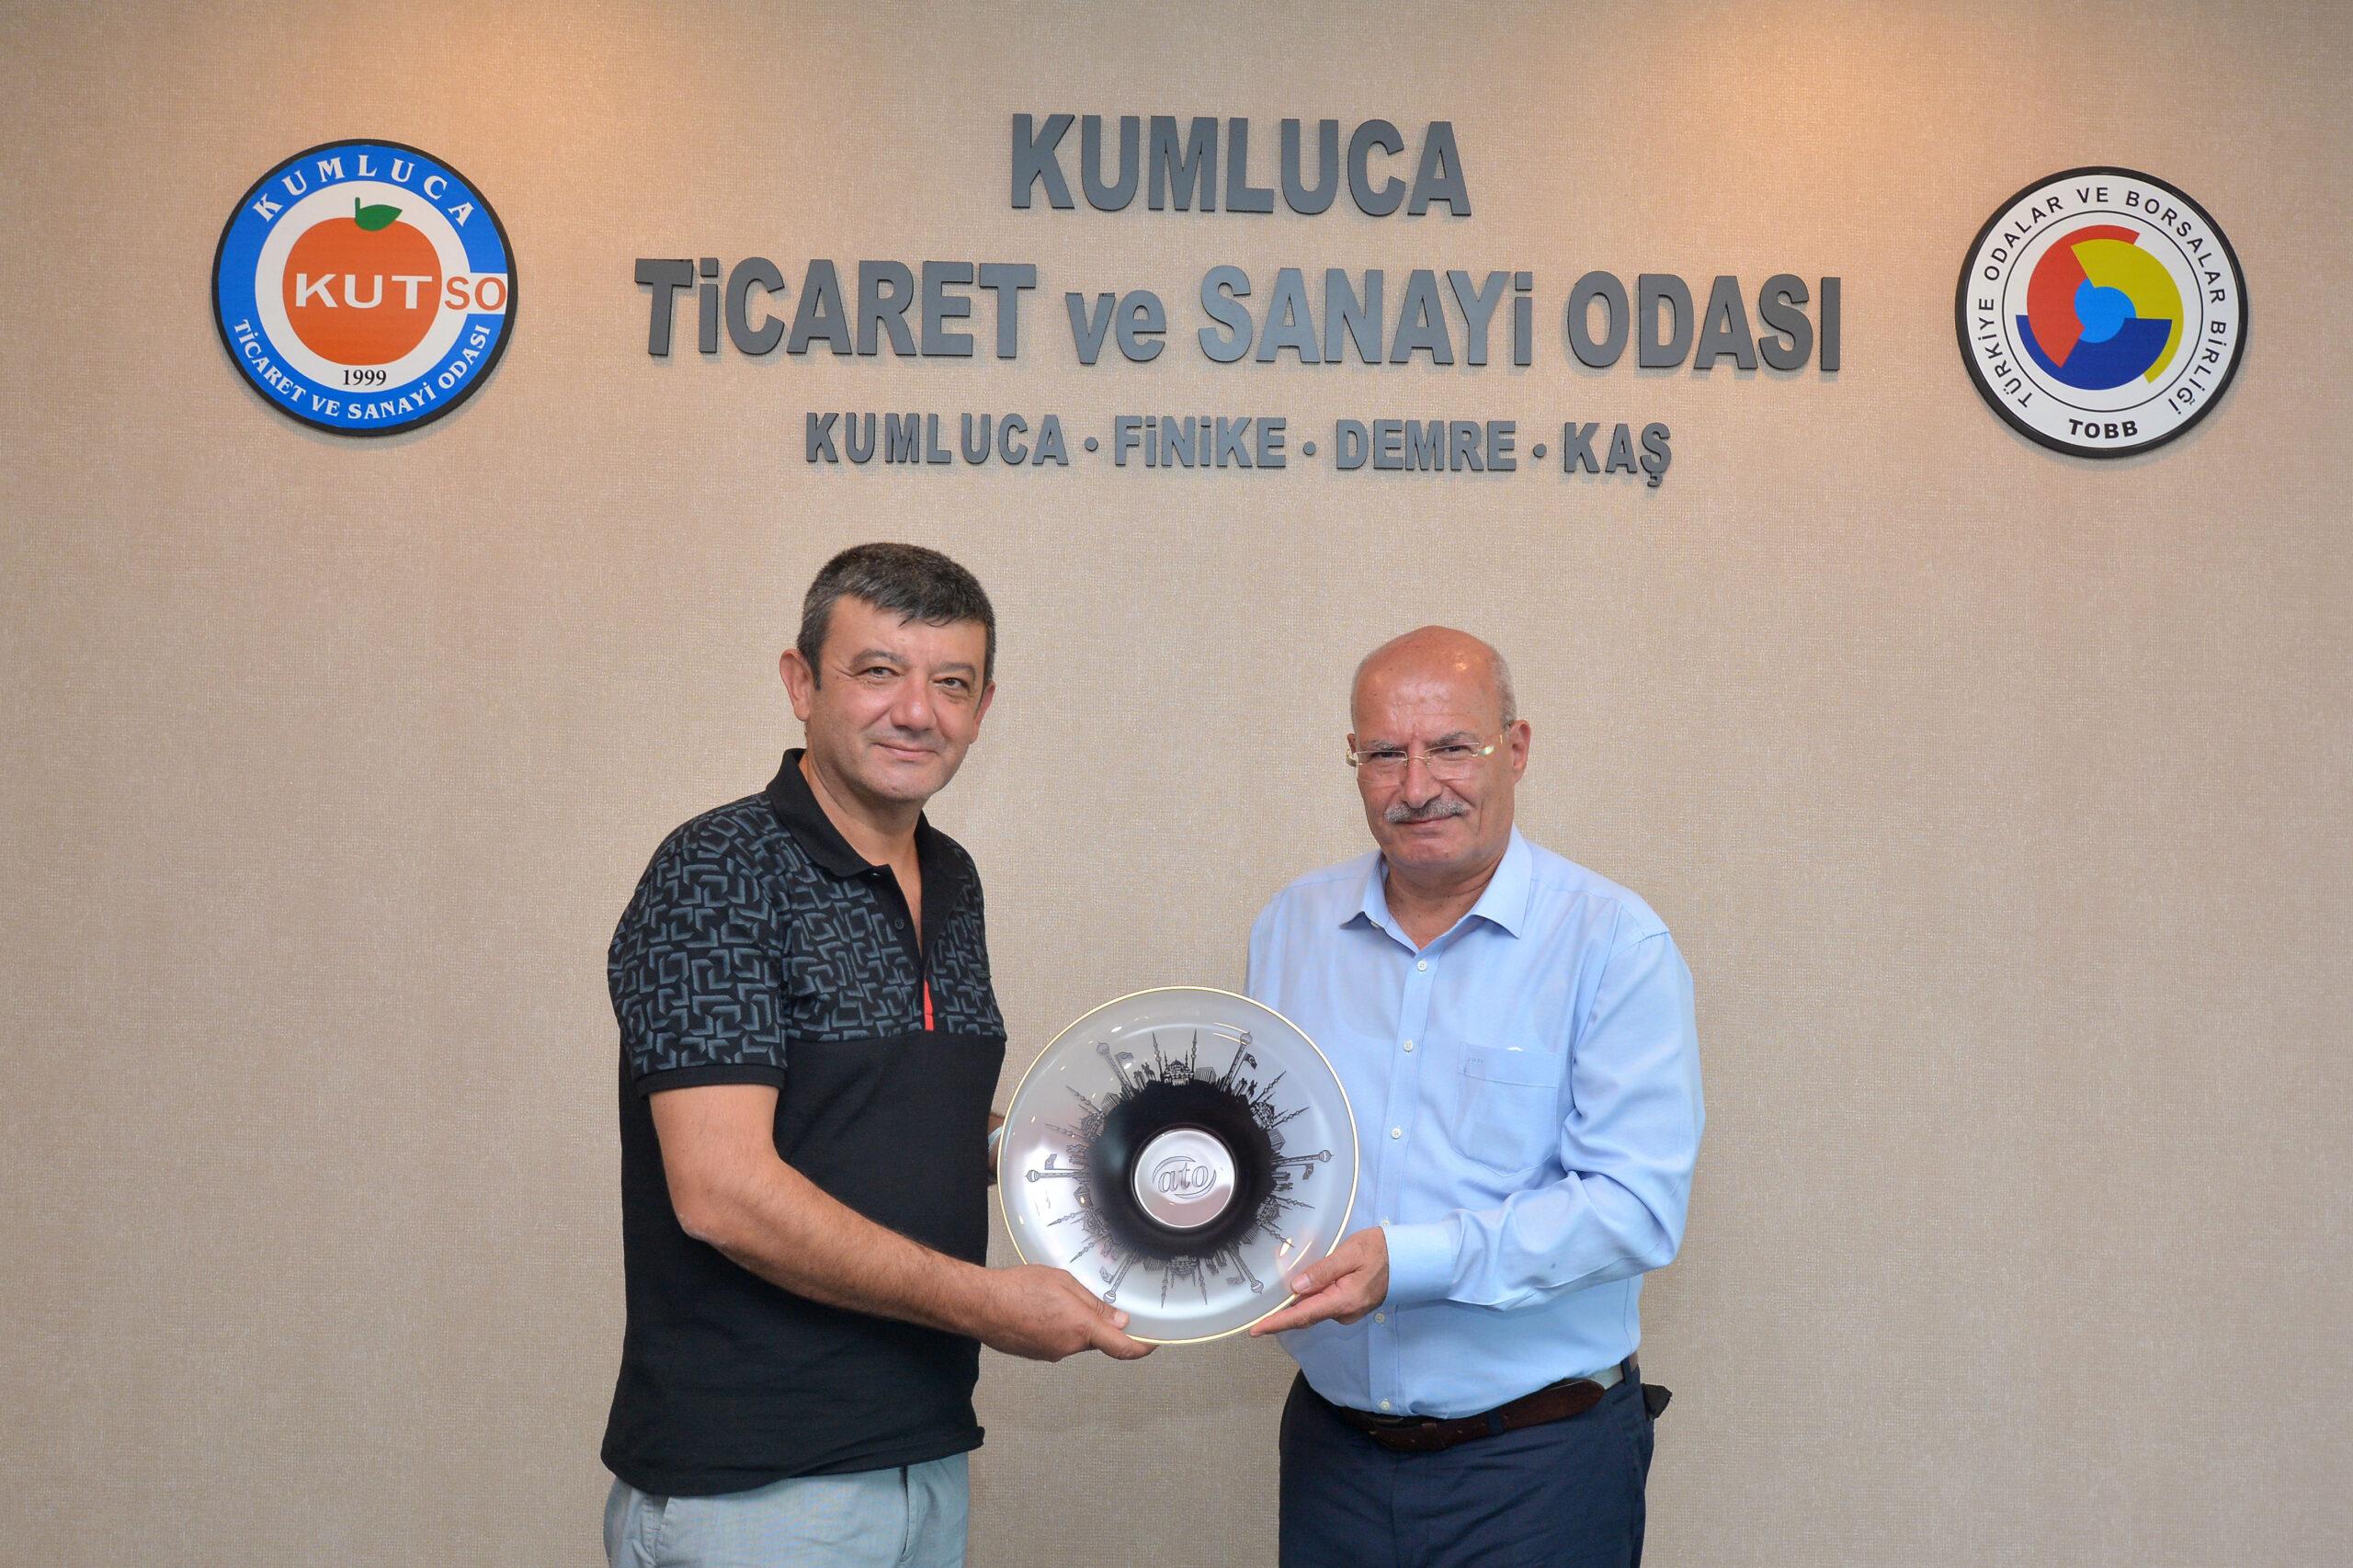 Ankara Ticaret Odası Başkanı Gürsel Baran KUTSO'yu ziyaret etti.